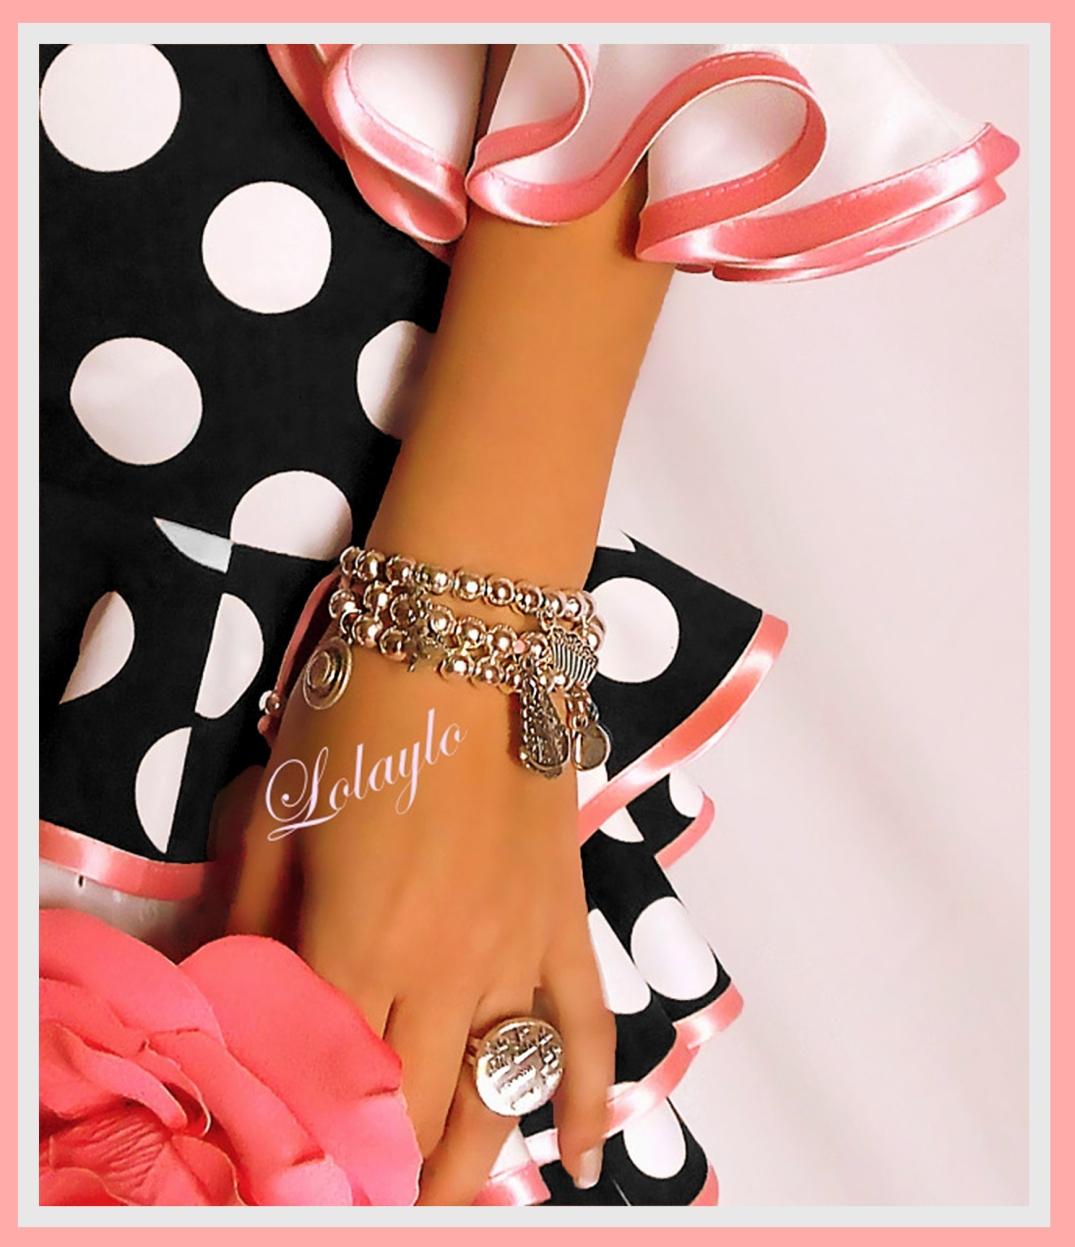 555a4-chocolate-rosa